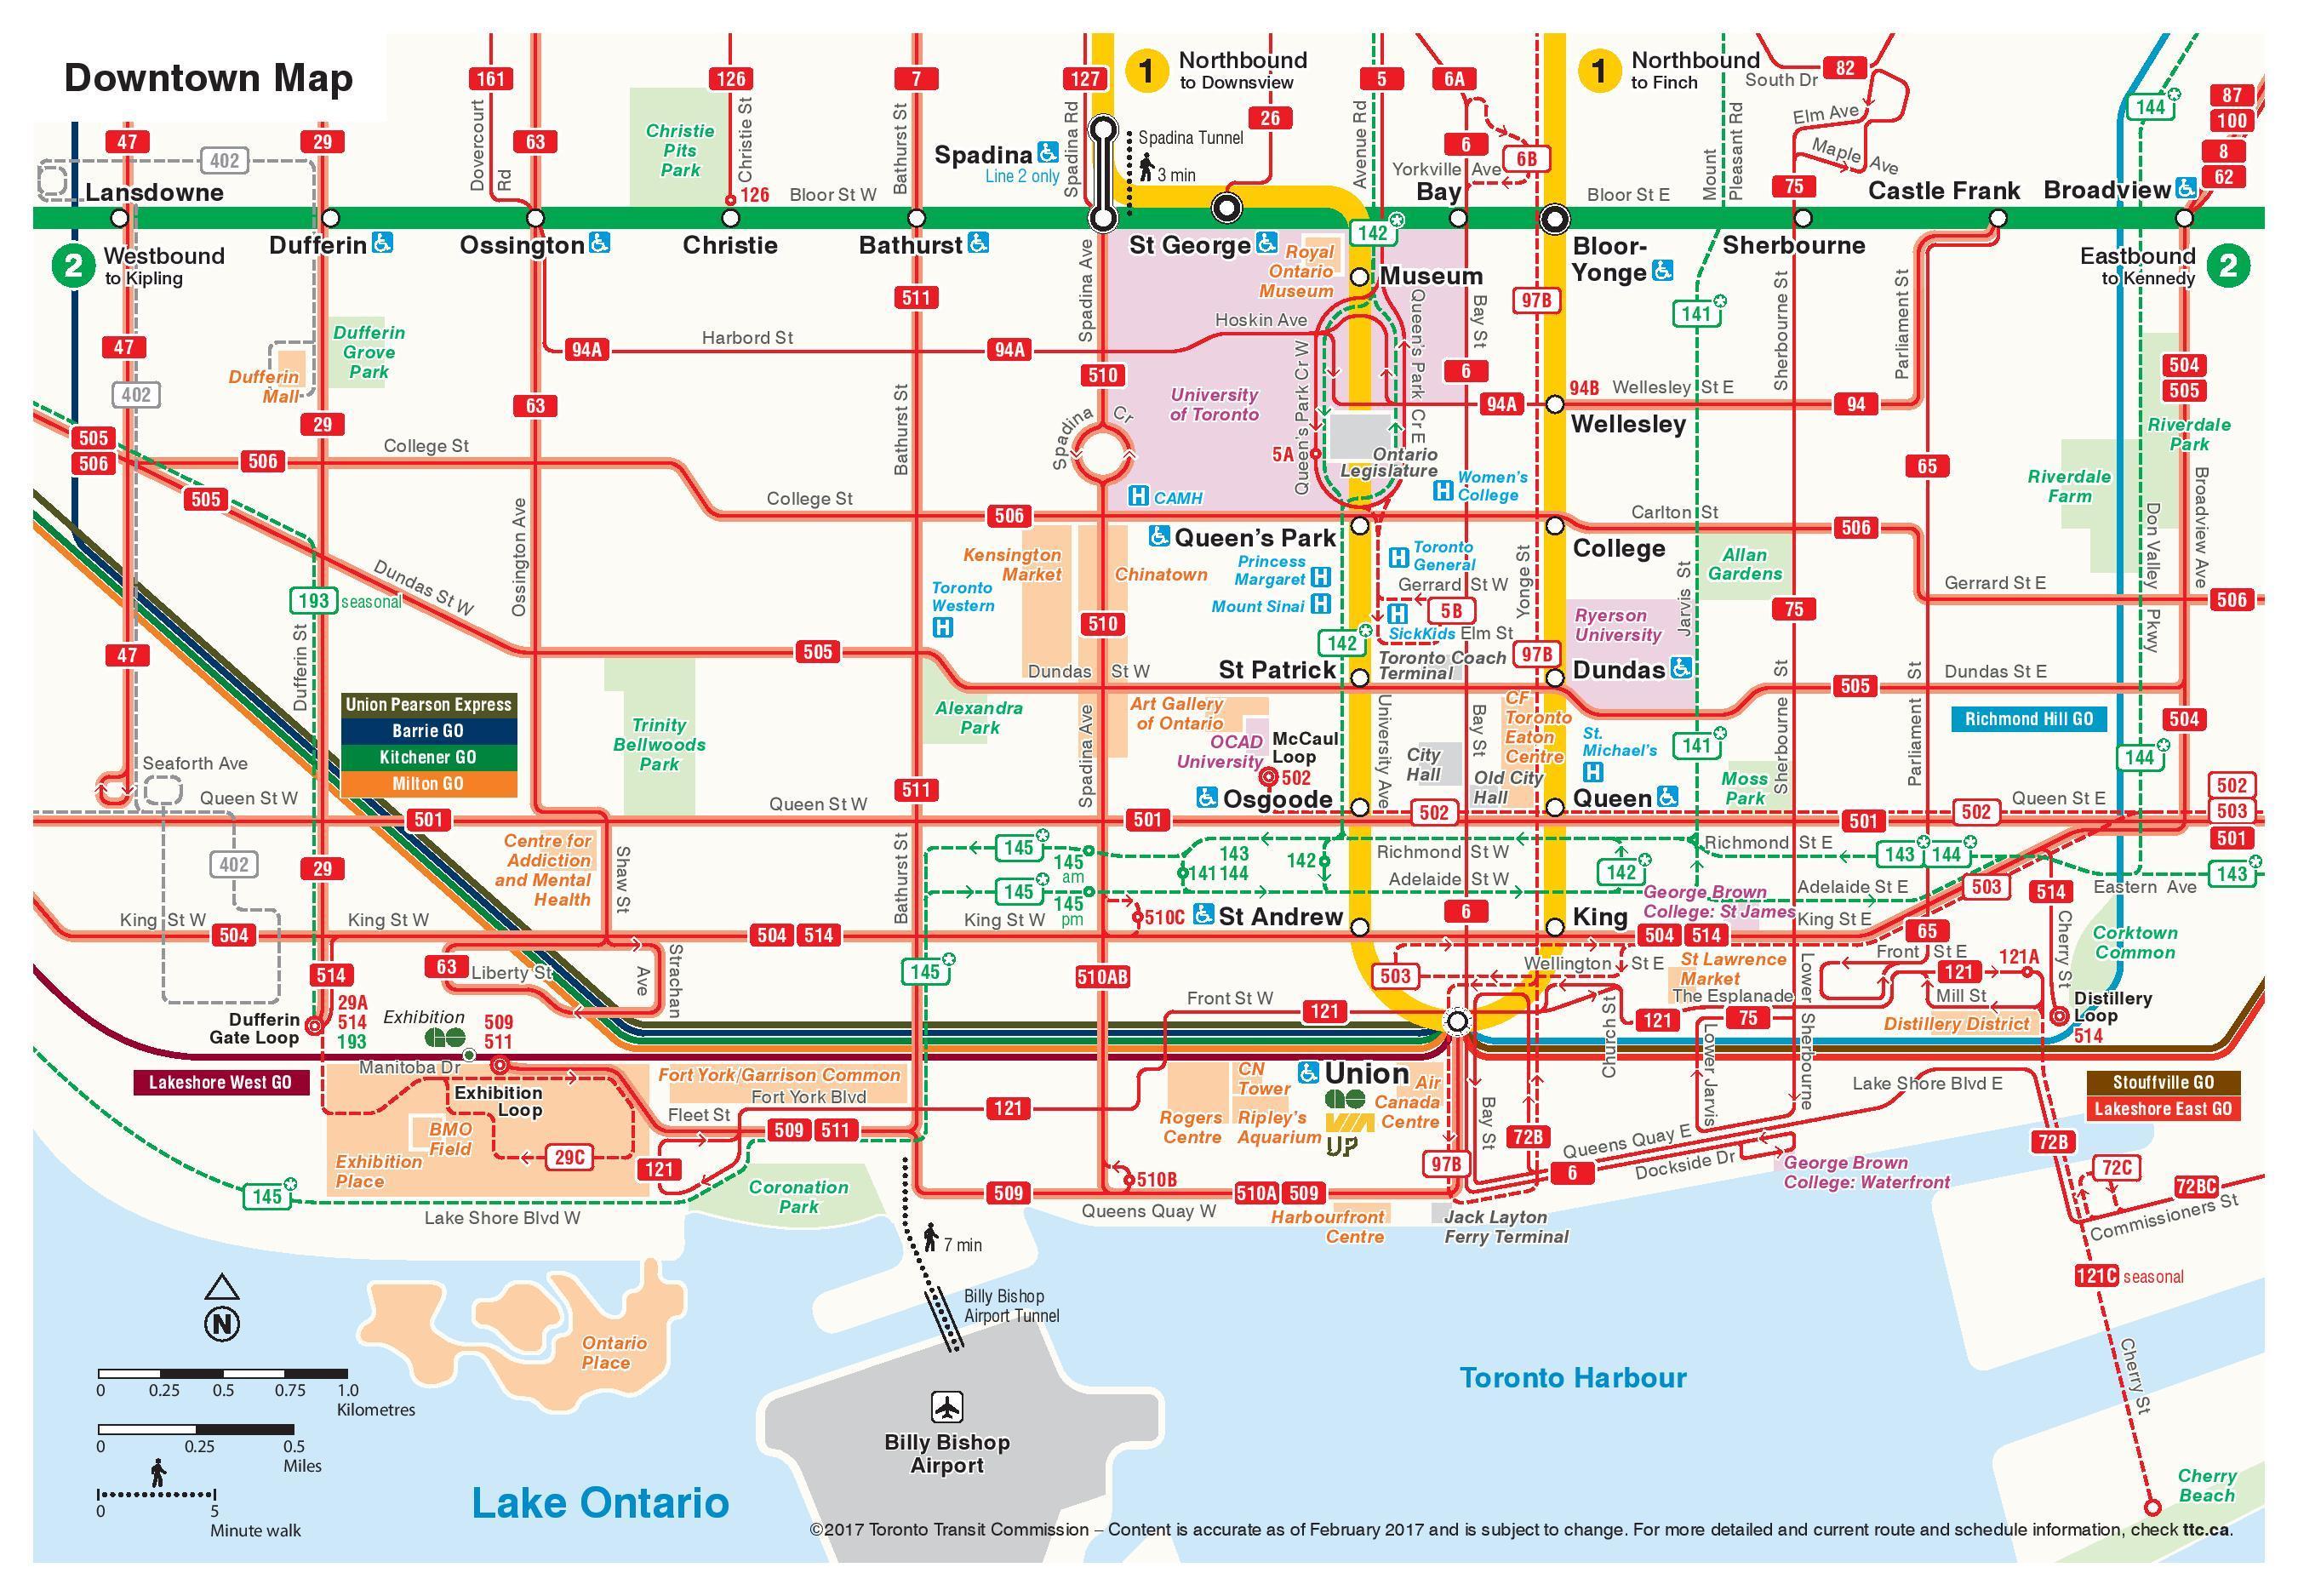 TTC downtown map - Karte des TTC downtown (Kanada) on